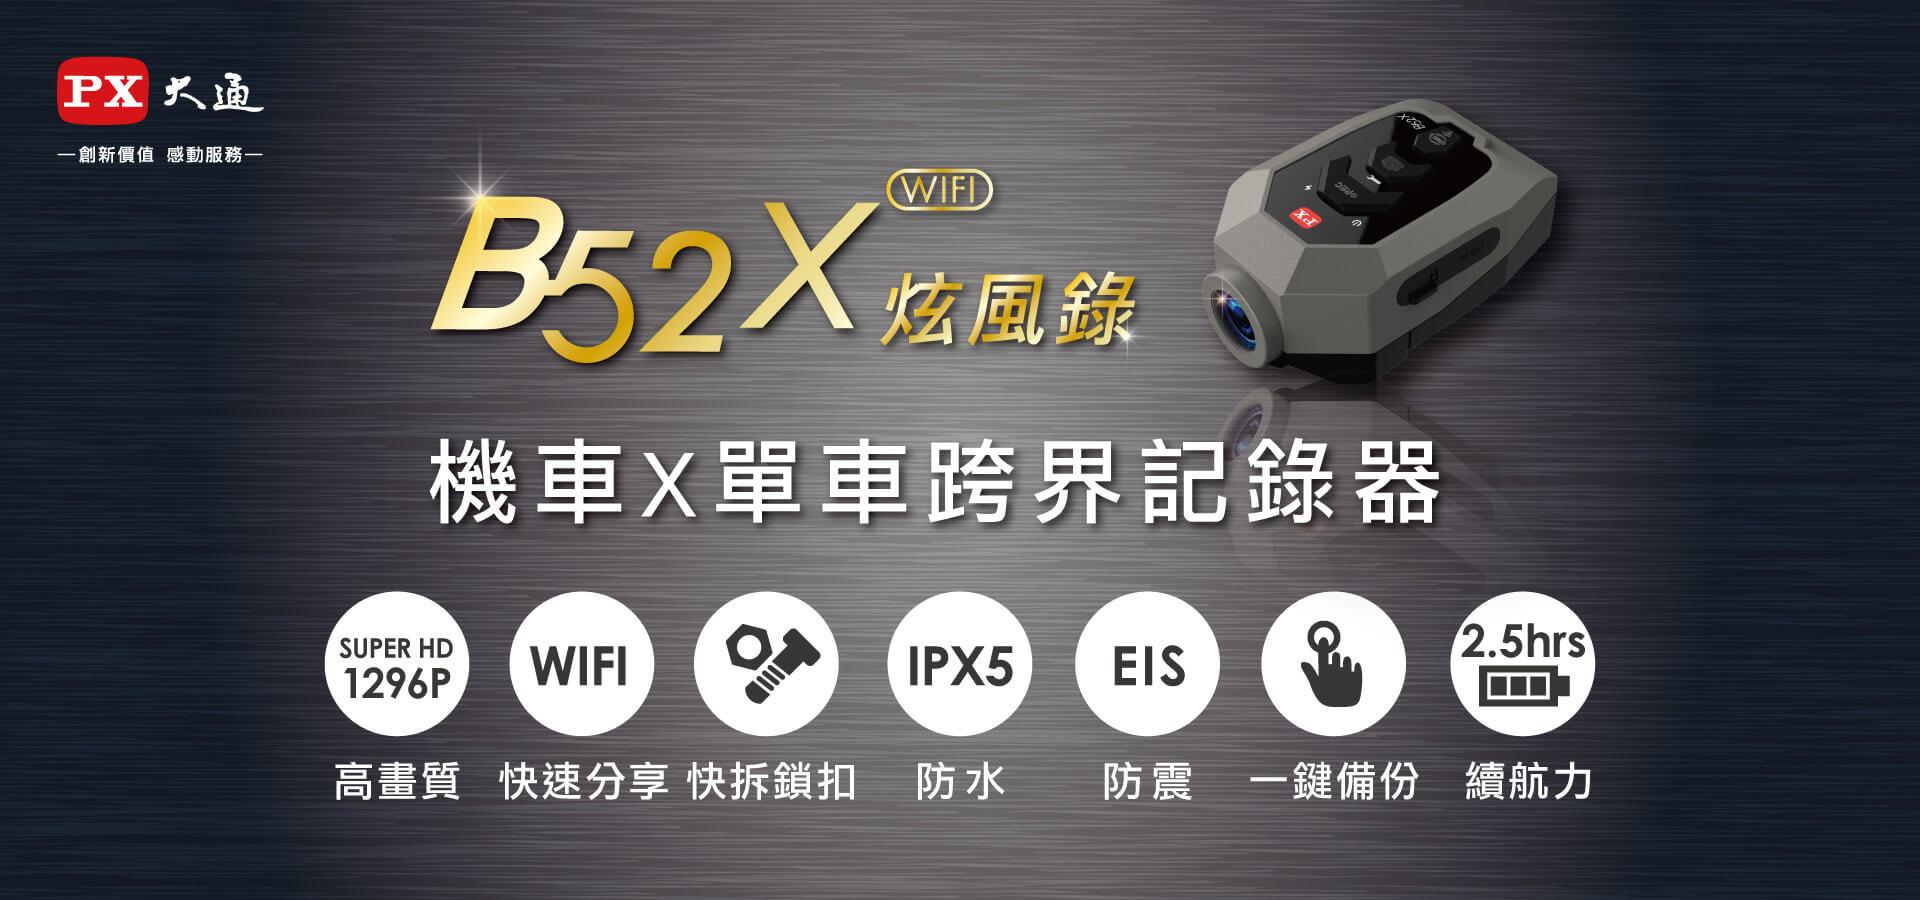 proimages/product/pro-01/pro-01-002/B52X/B52X-04.jpg